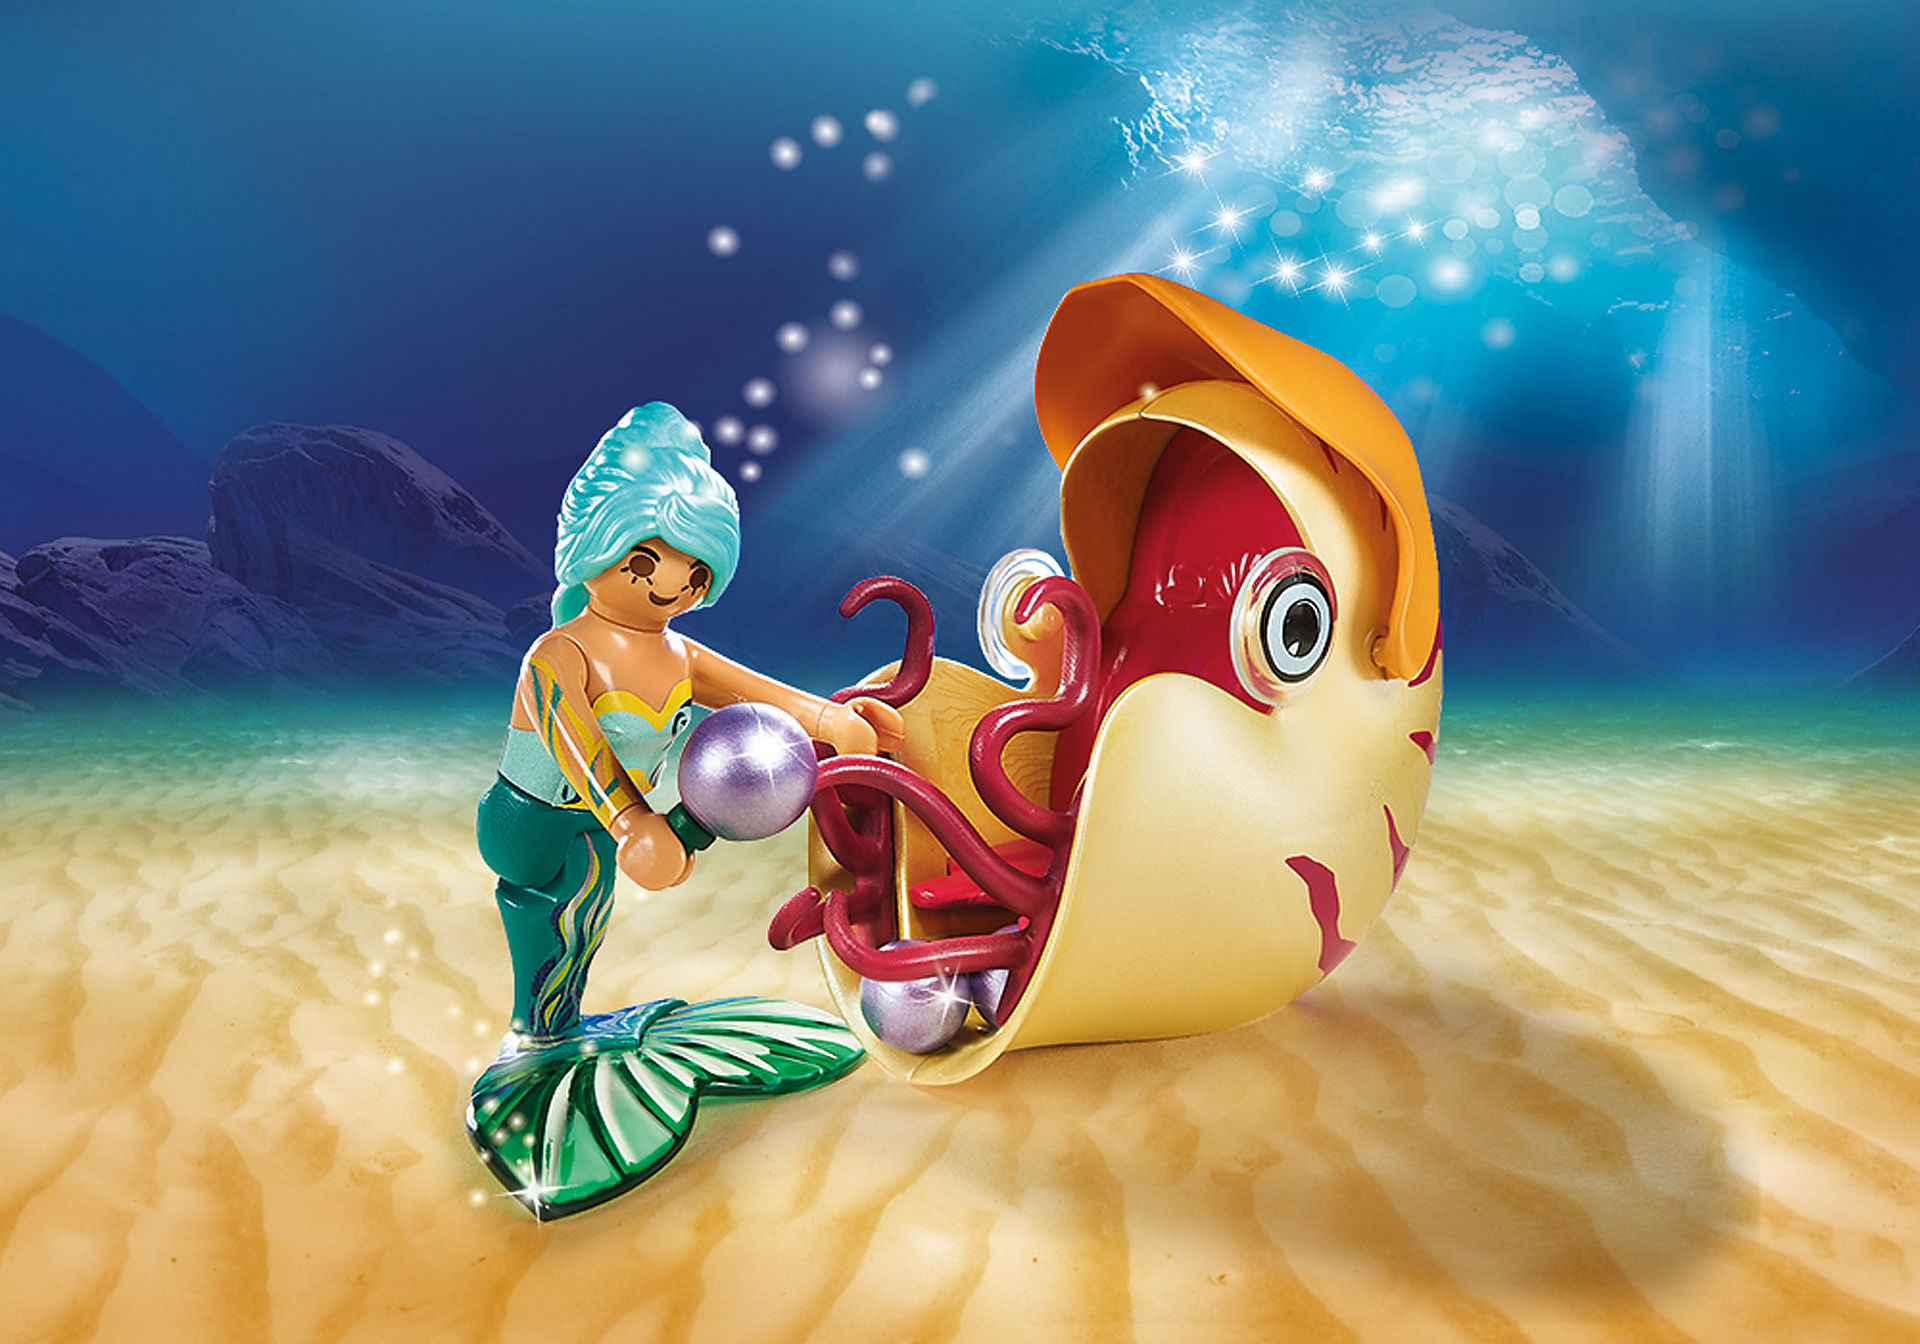 70098 Sirena con carrozza nautilus zoom image5